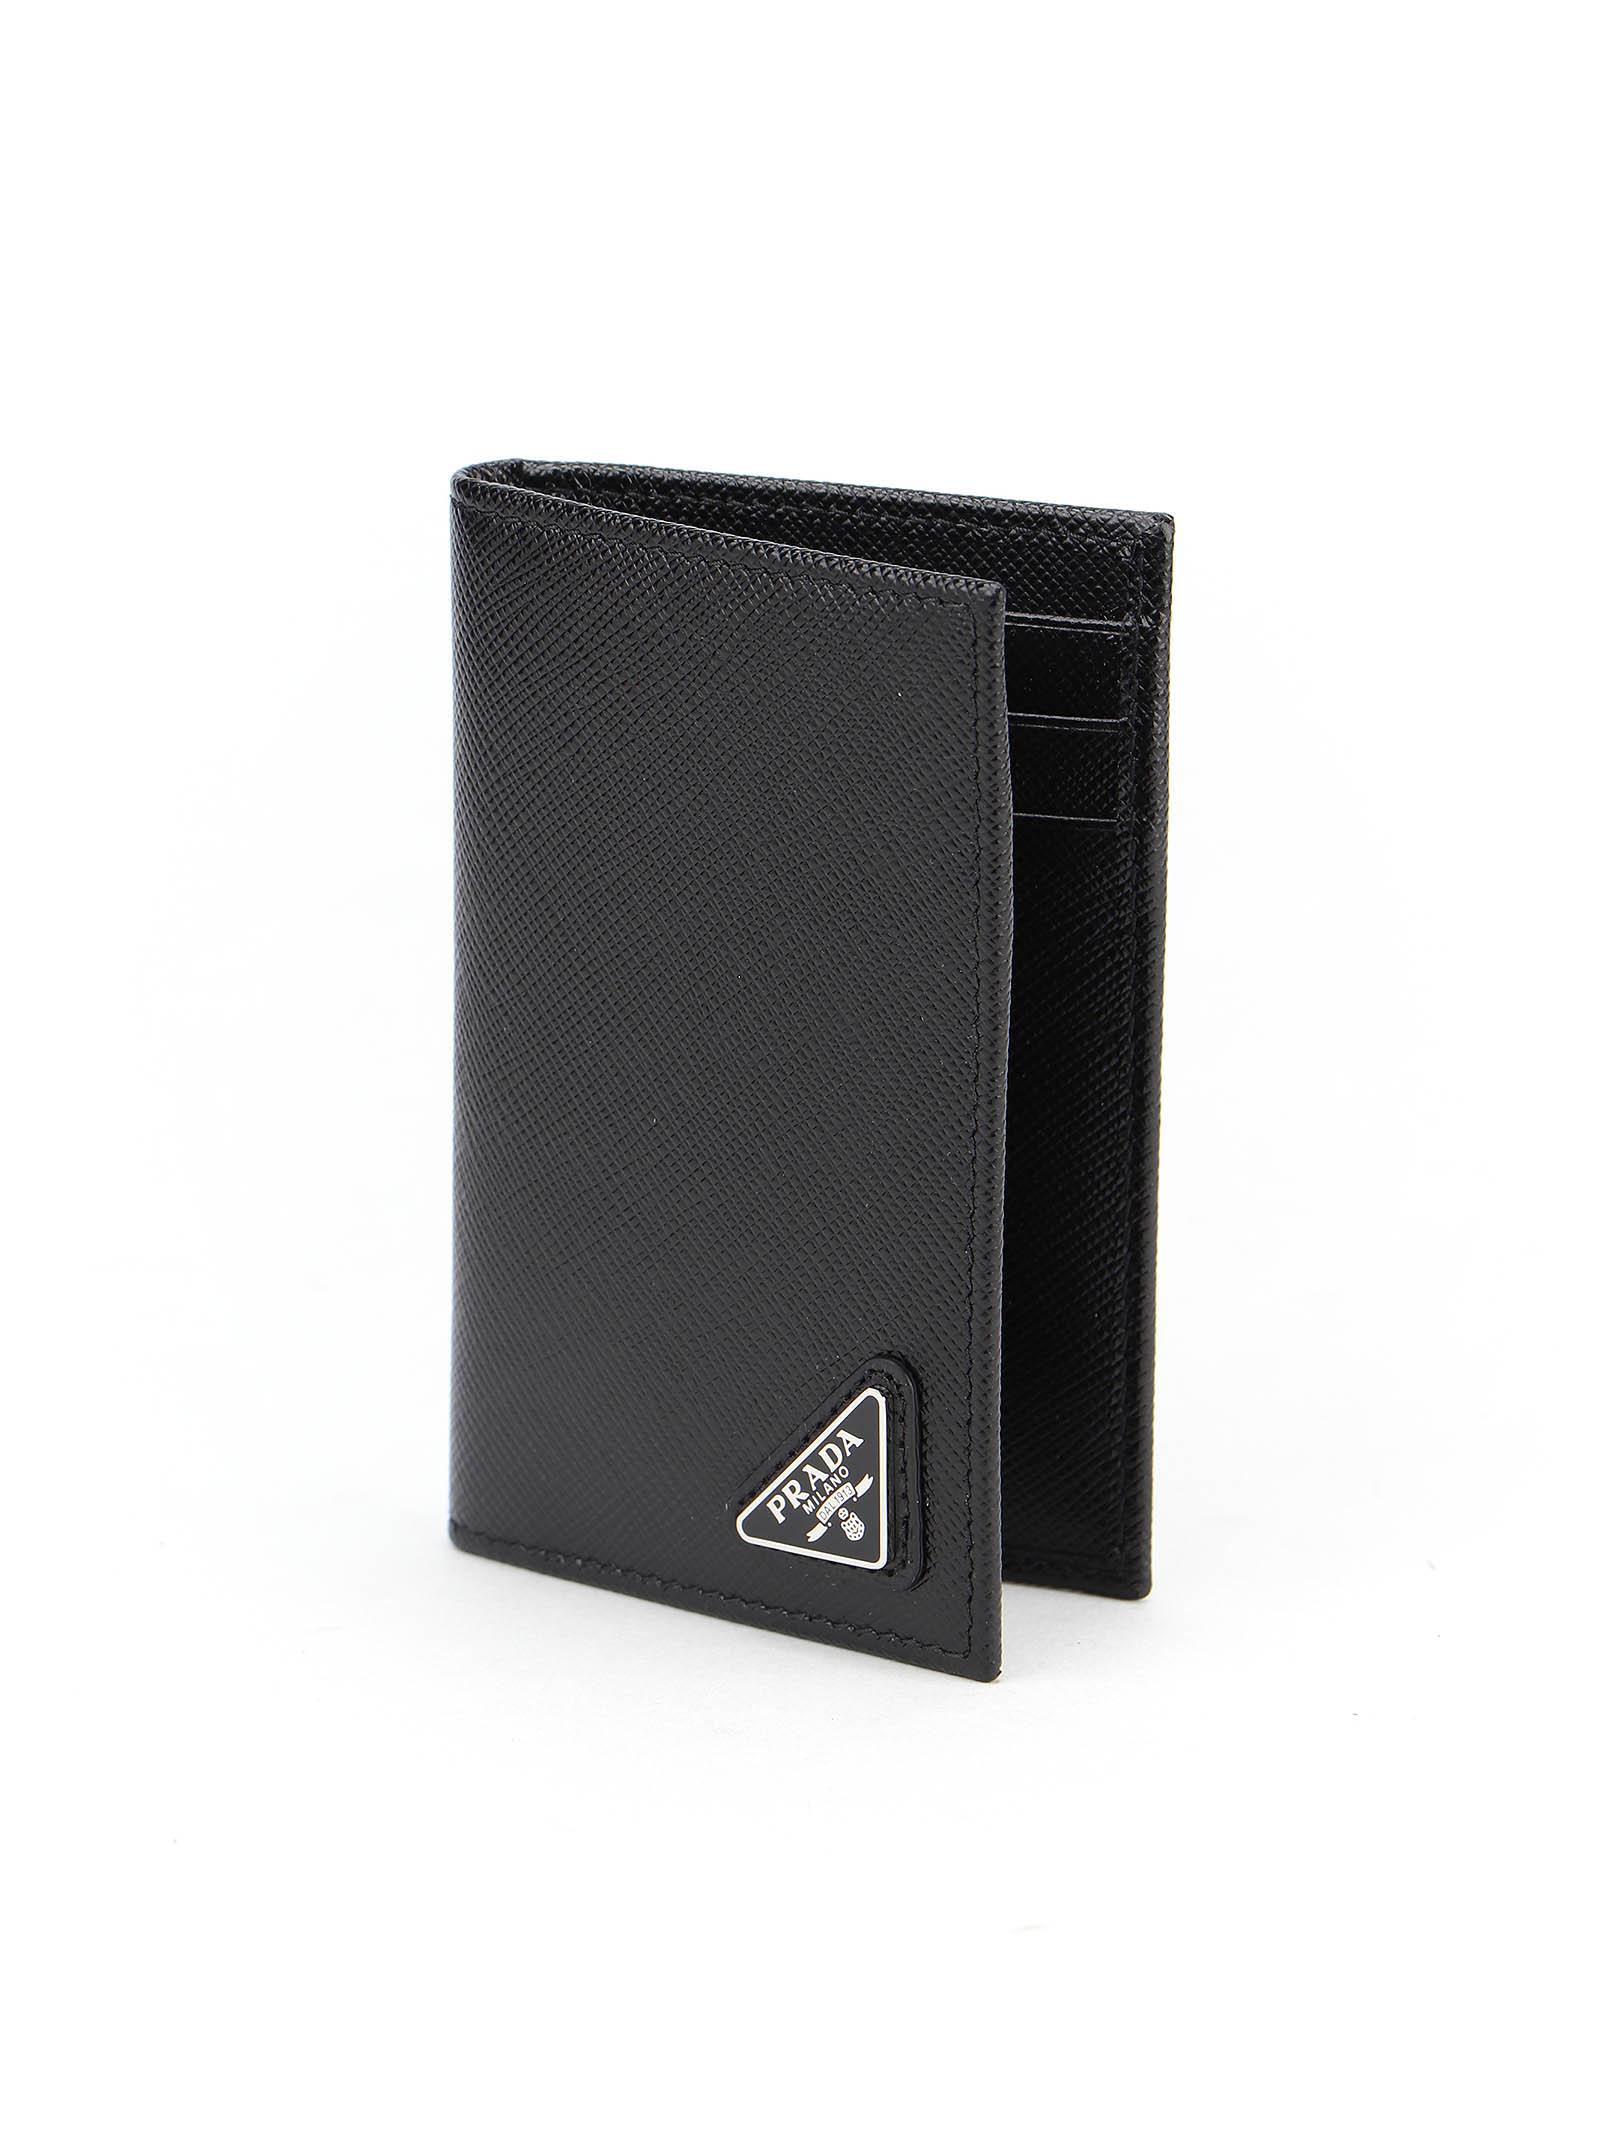 Immagine di Prada | Saffiano Leather Card Holder